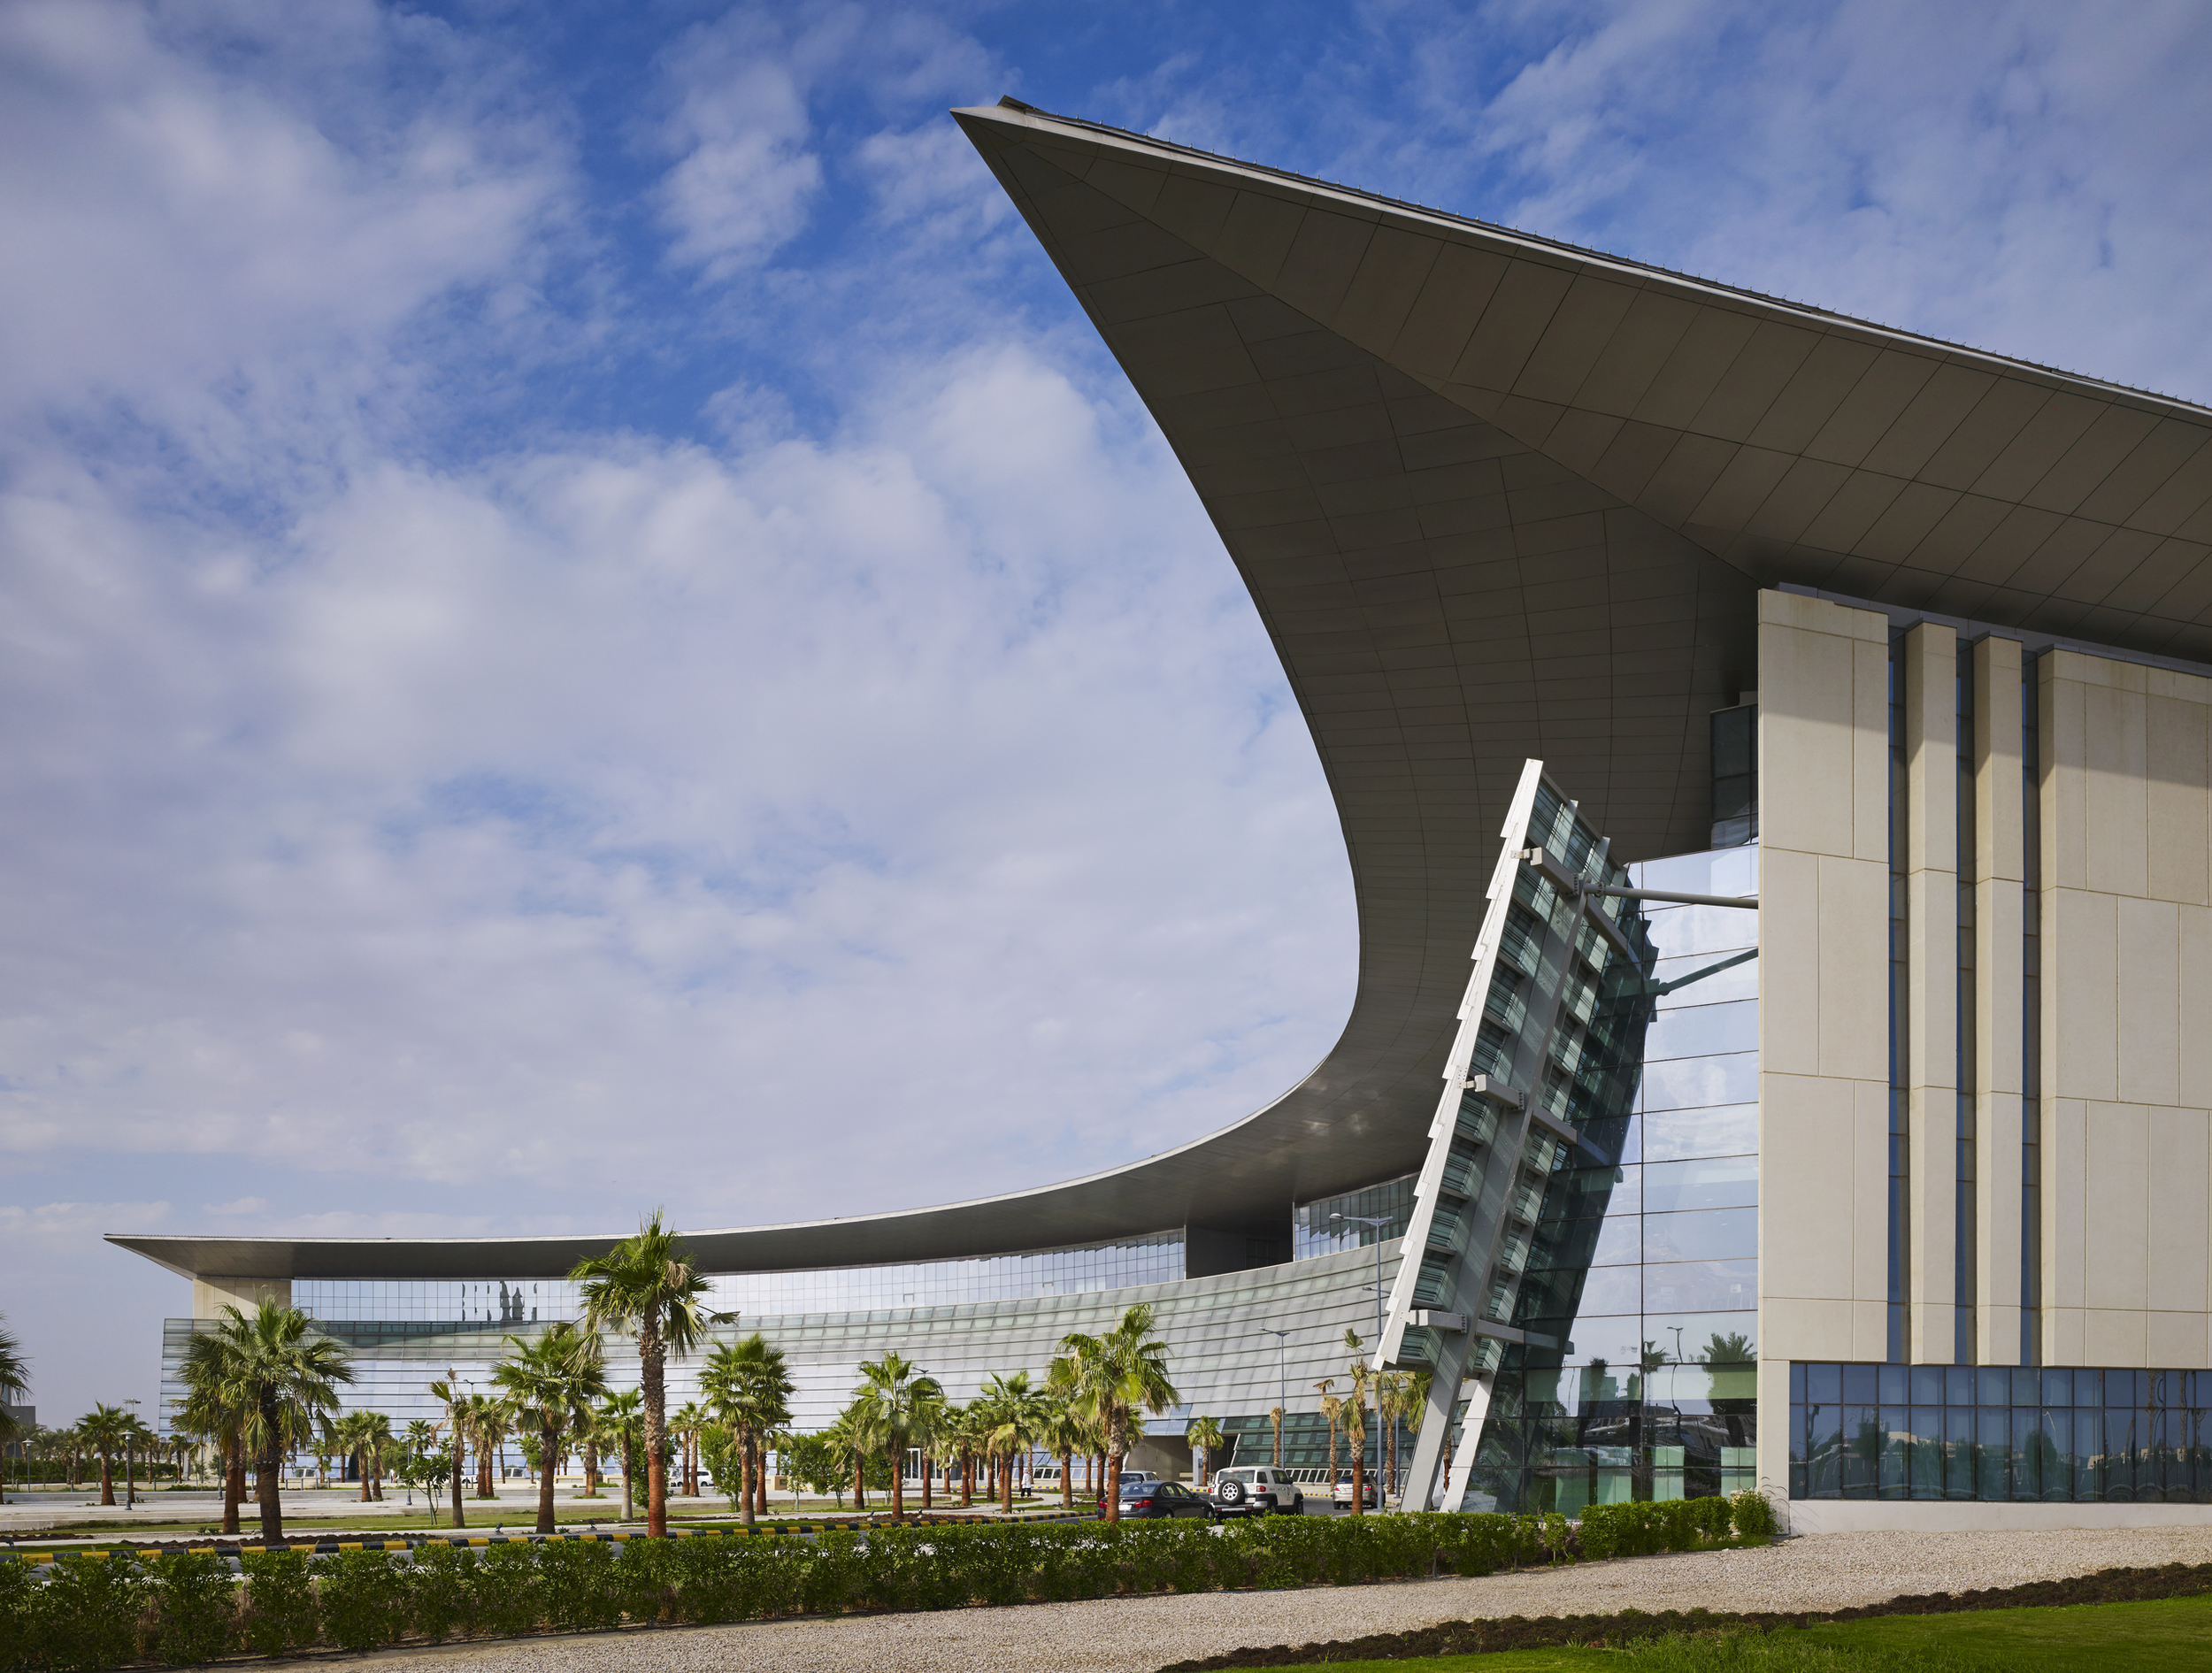 KSAU Al Ahsa Campus  Perkins+Will with Dar Al Handasah (Shair and Partners)  Al Ahsa, Saudi Arabia     Return to Projects